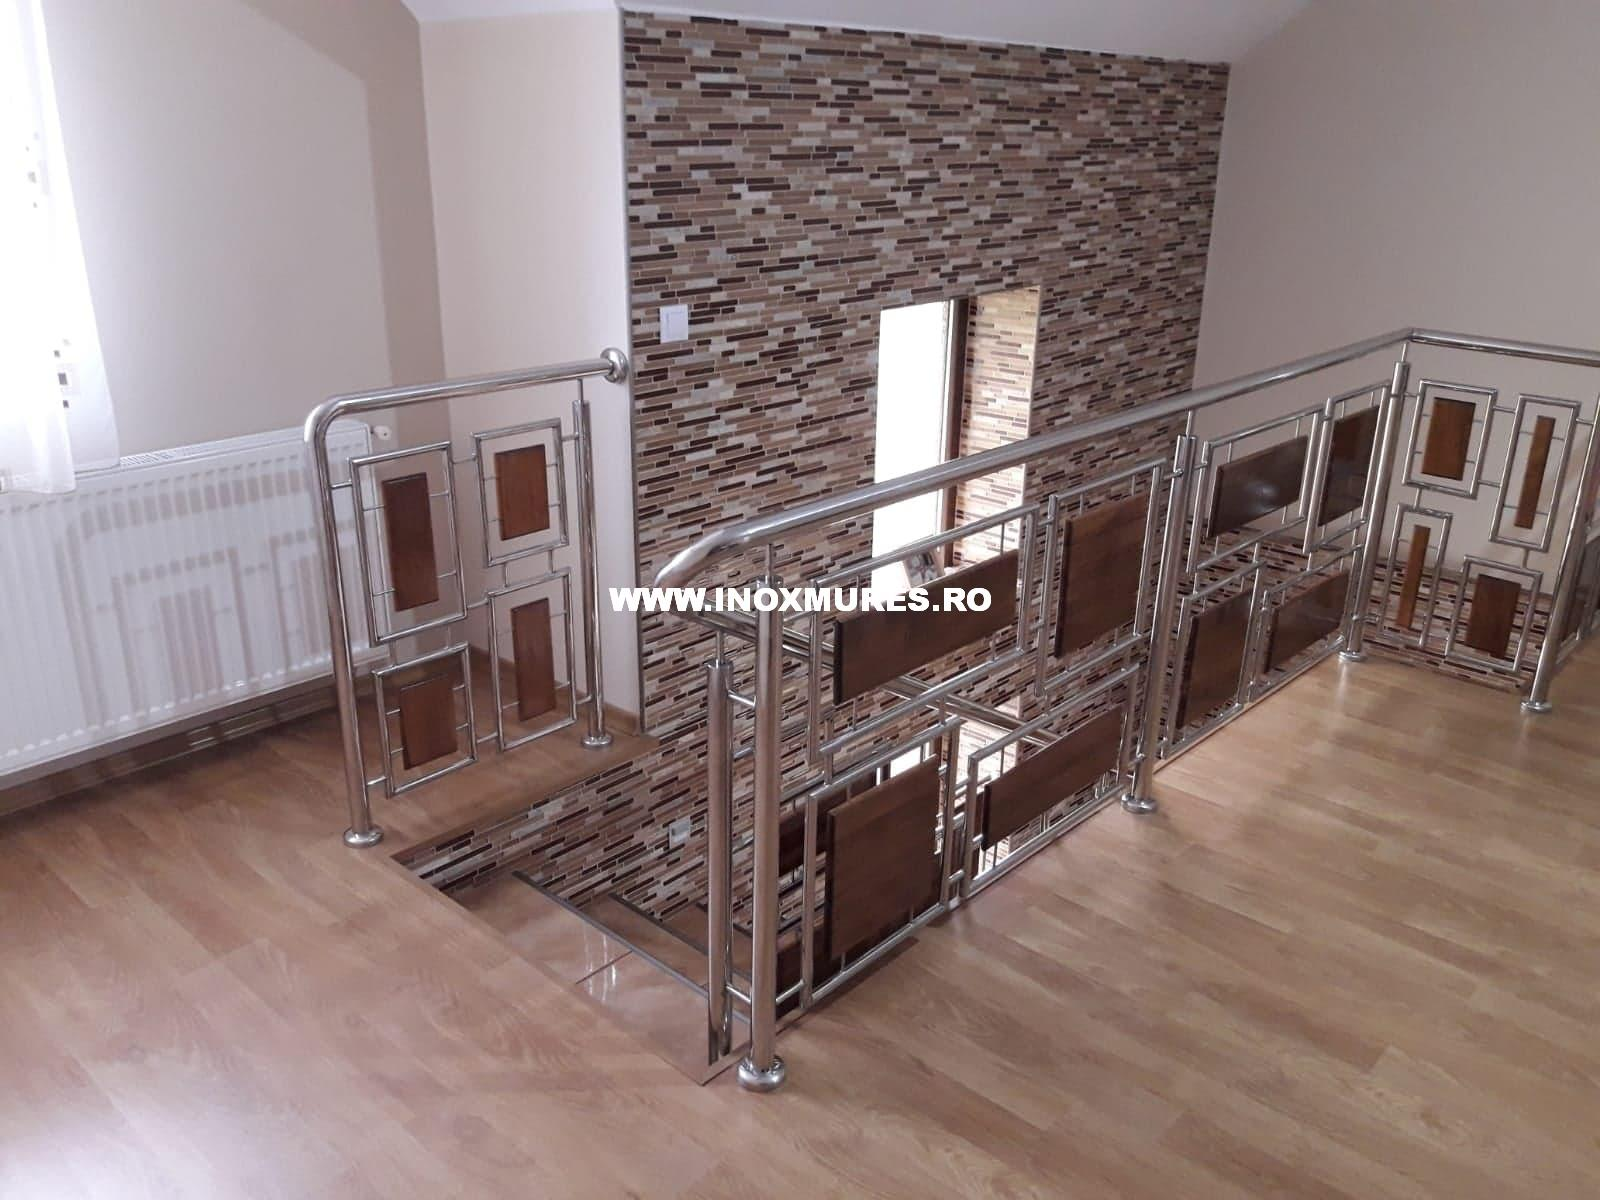 Balustrada  din inox combinata cu lemn Sarmas 10.06.2020